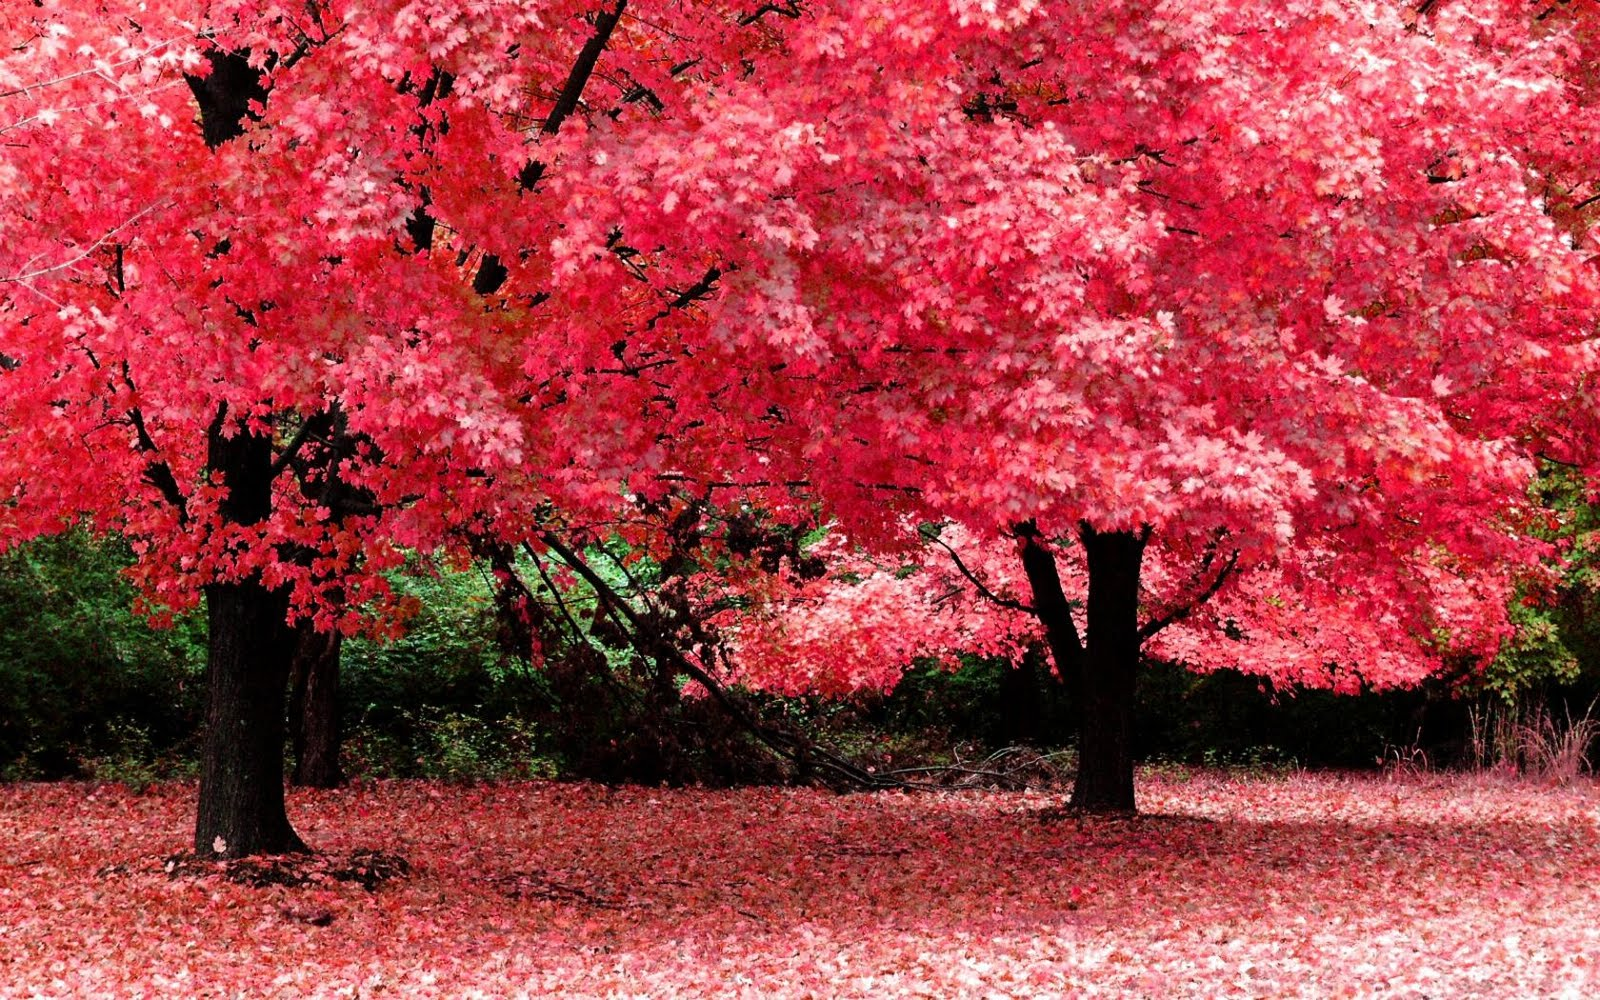 Autumn Season Nature Fantasy Wallpaper